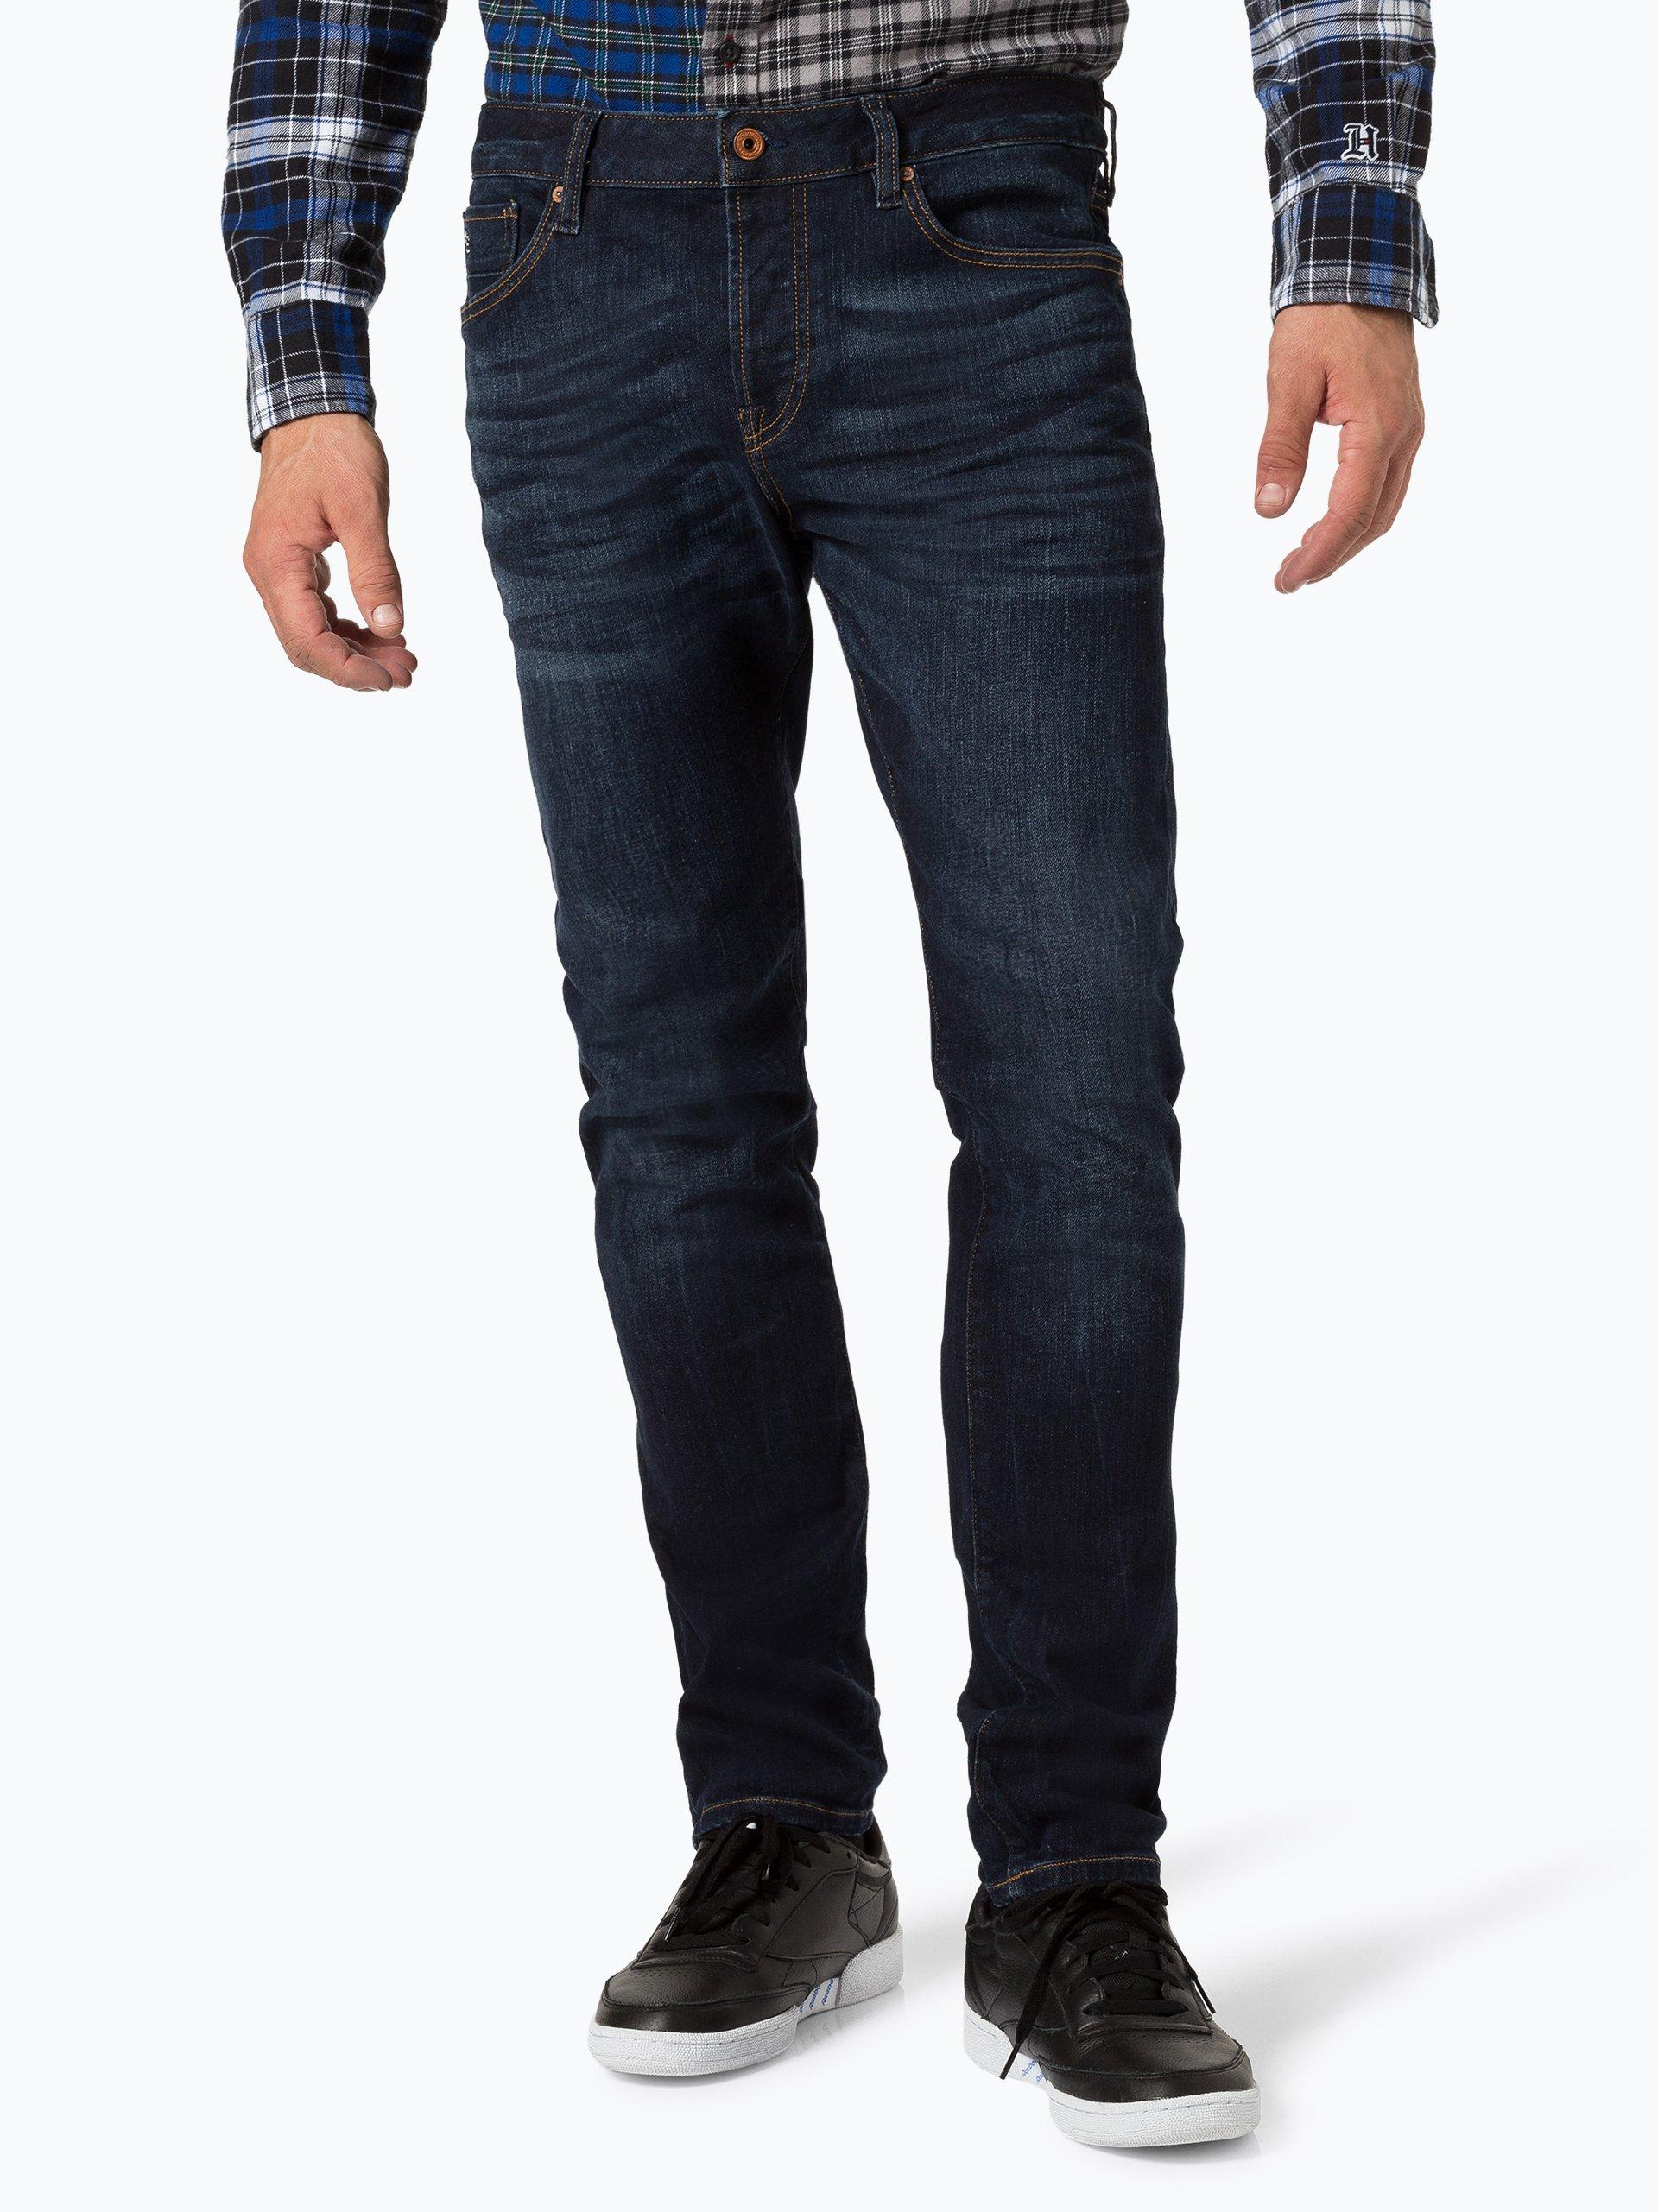 Scotch & Soda Herren Jeans - Ralston